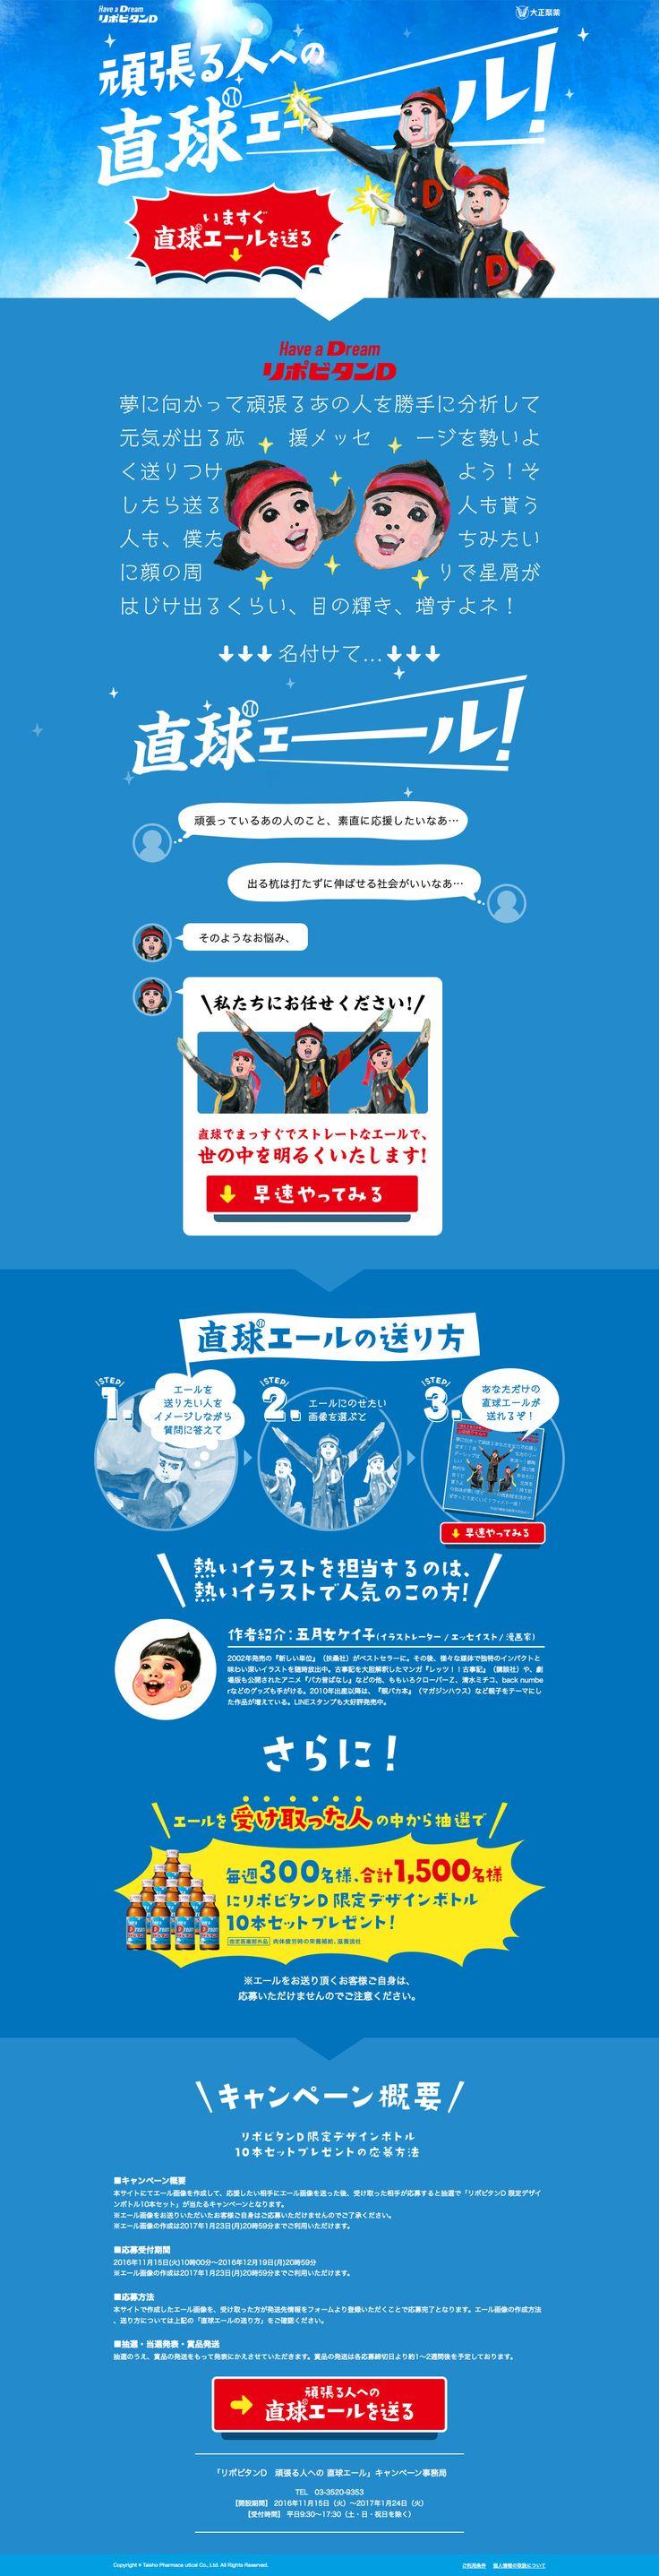 Have a Dream リポビタンD 頑張る人への直球エール https://lipod-chokkyu-yell.jp/